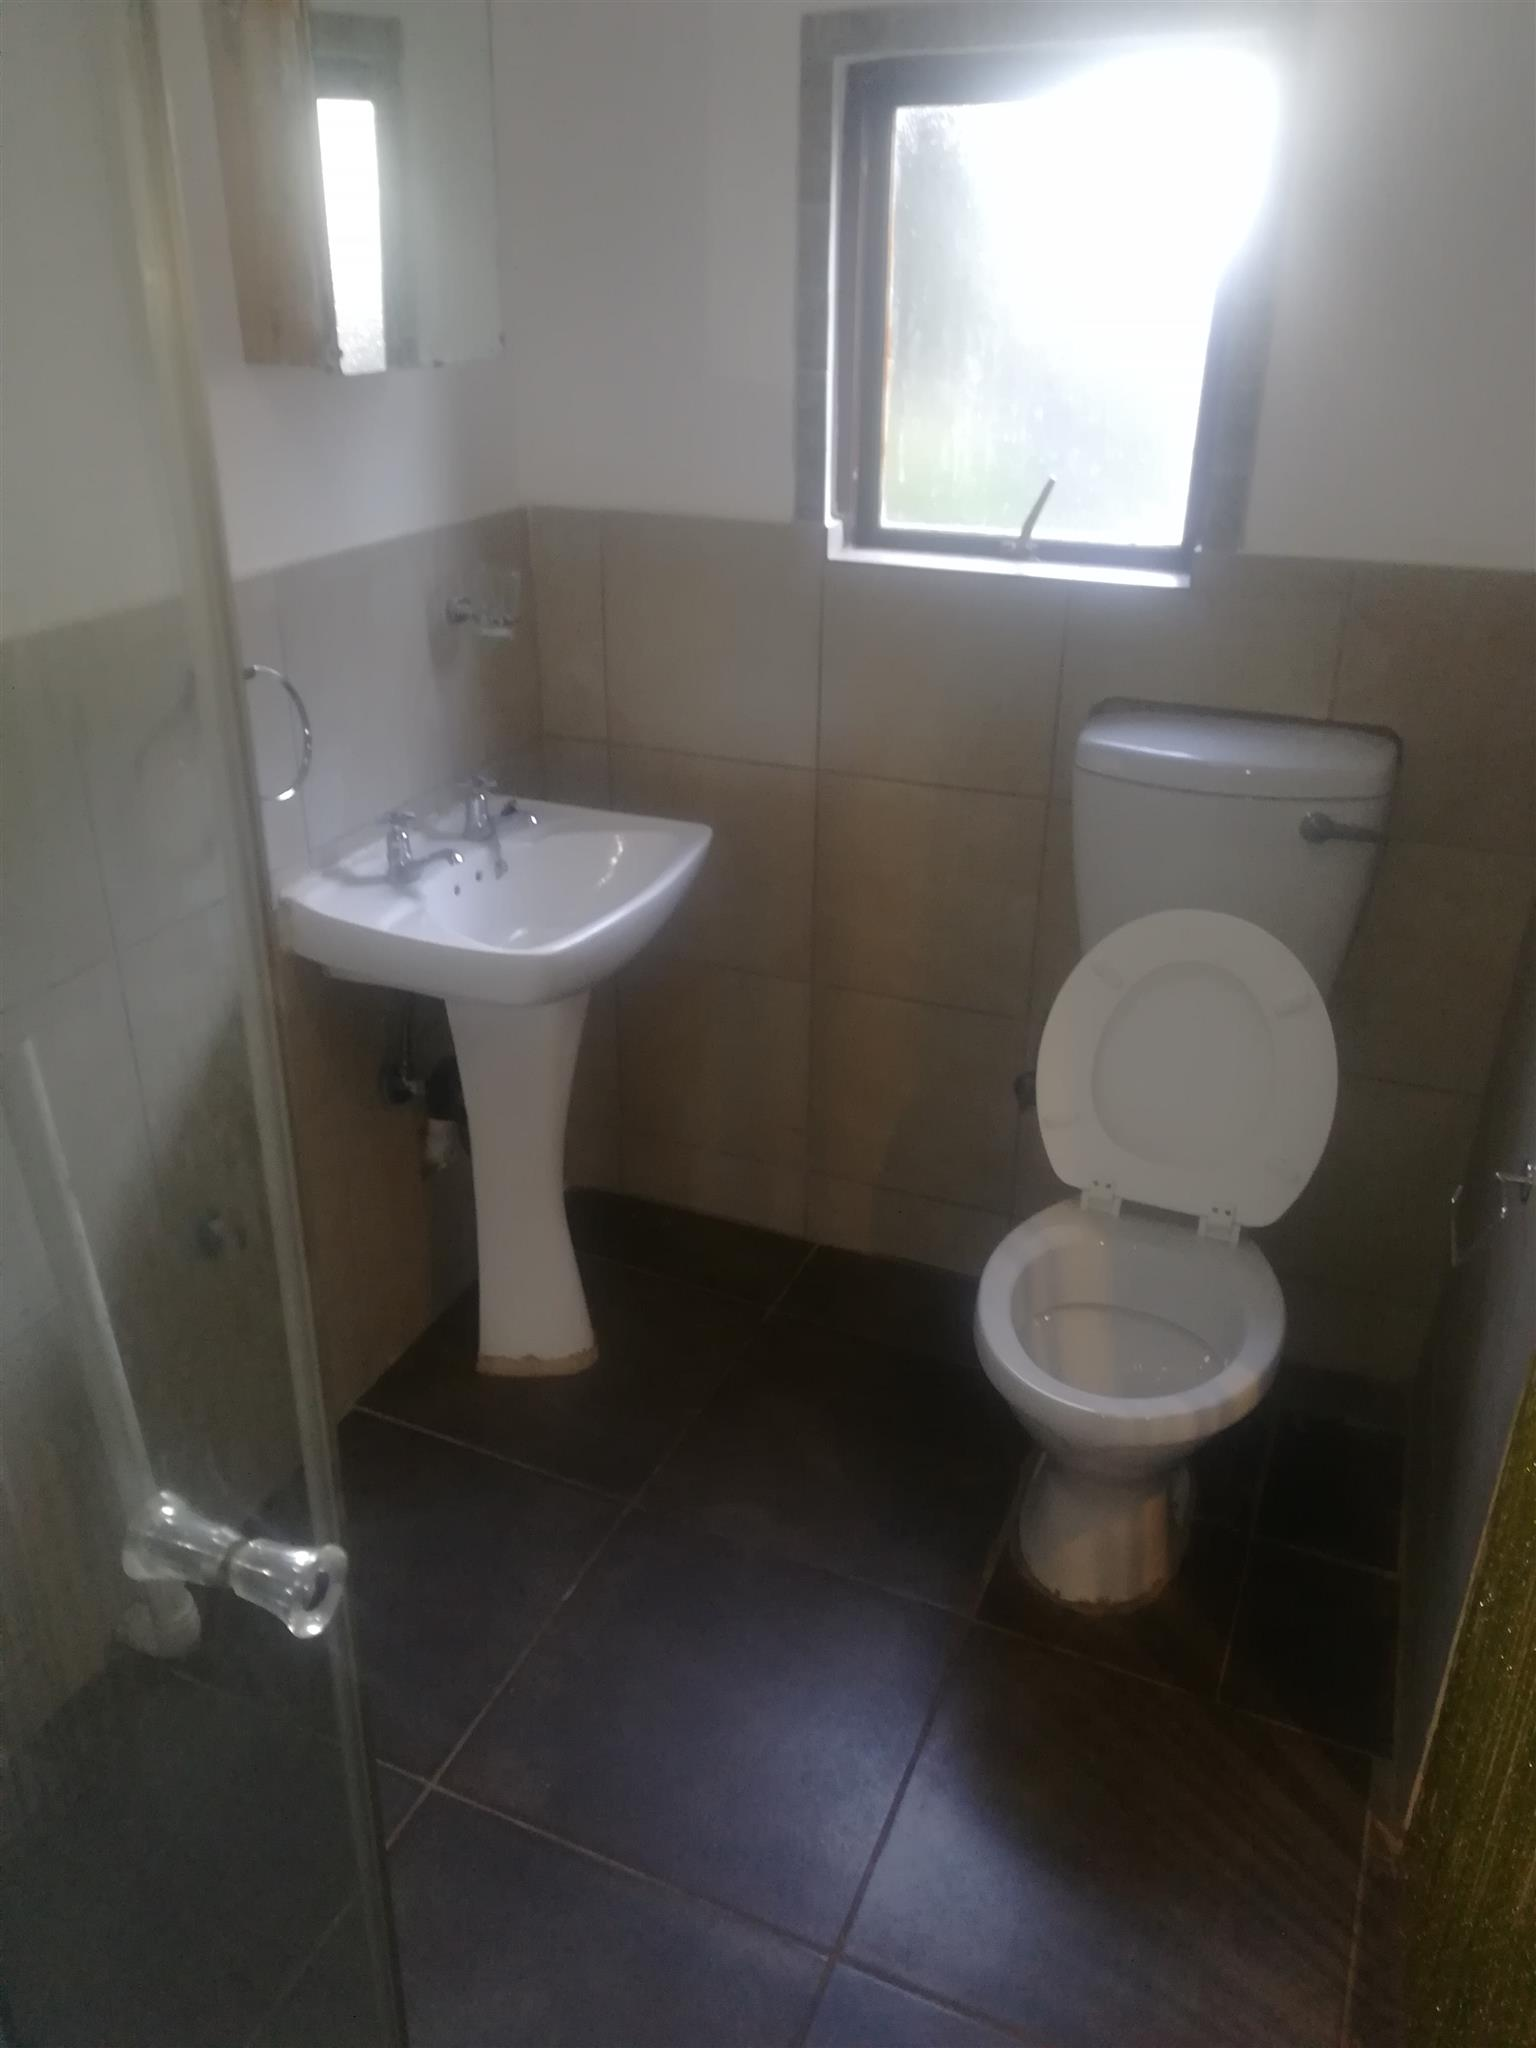 1bed garden cottage for rent claremont jhb R3800